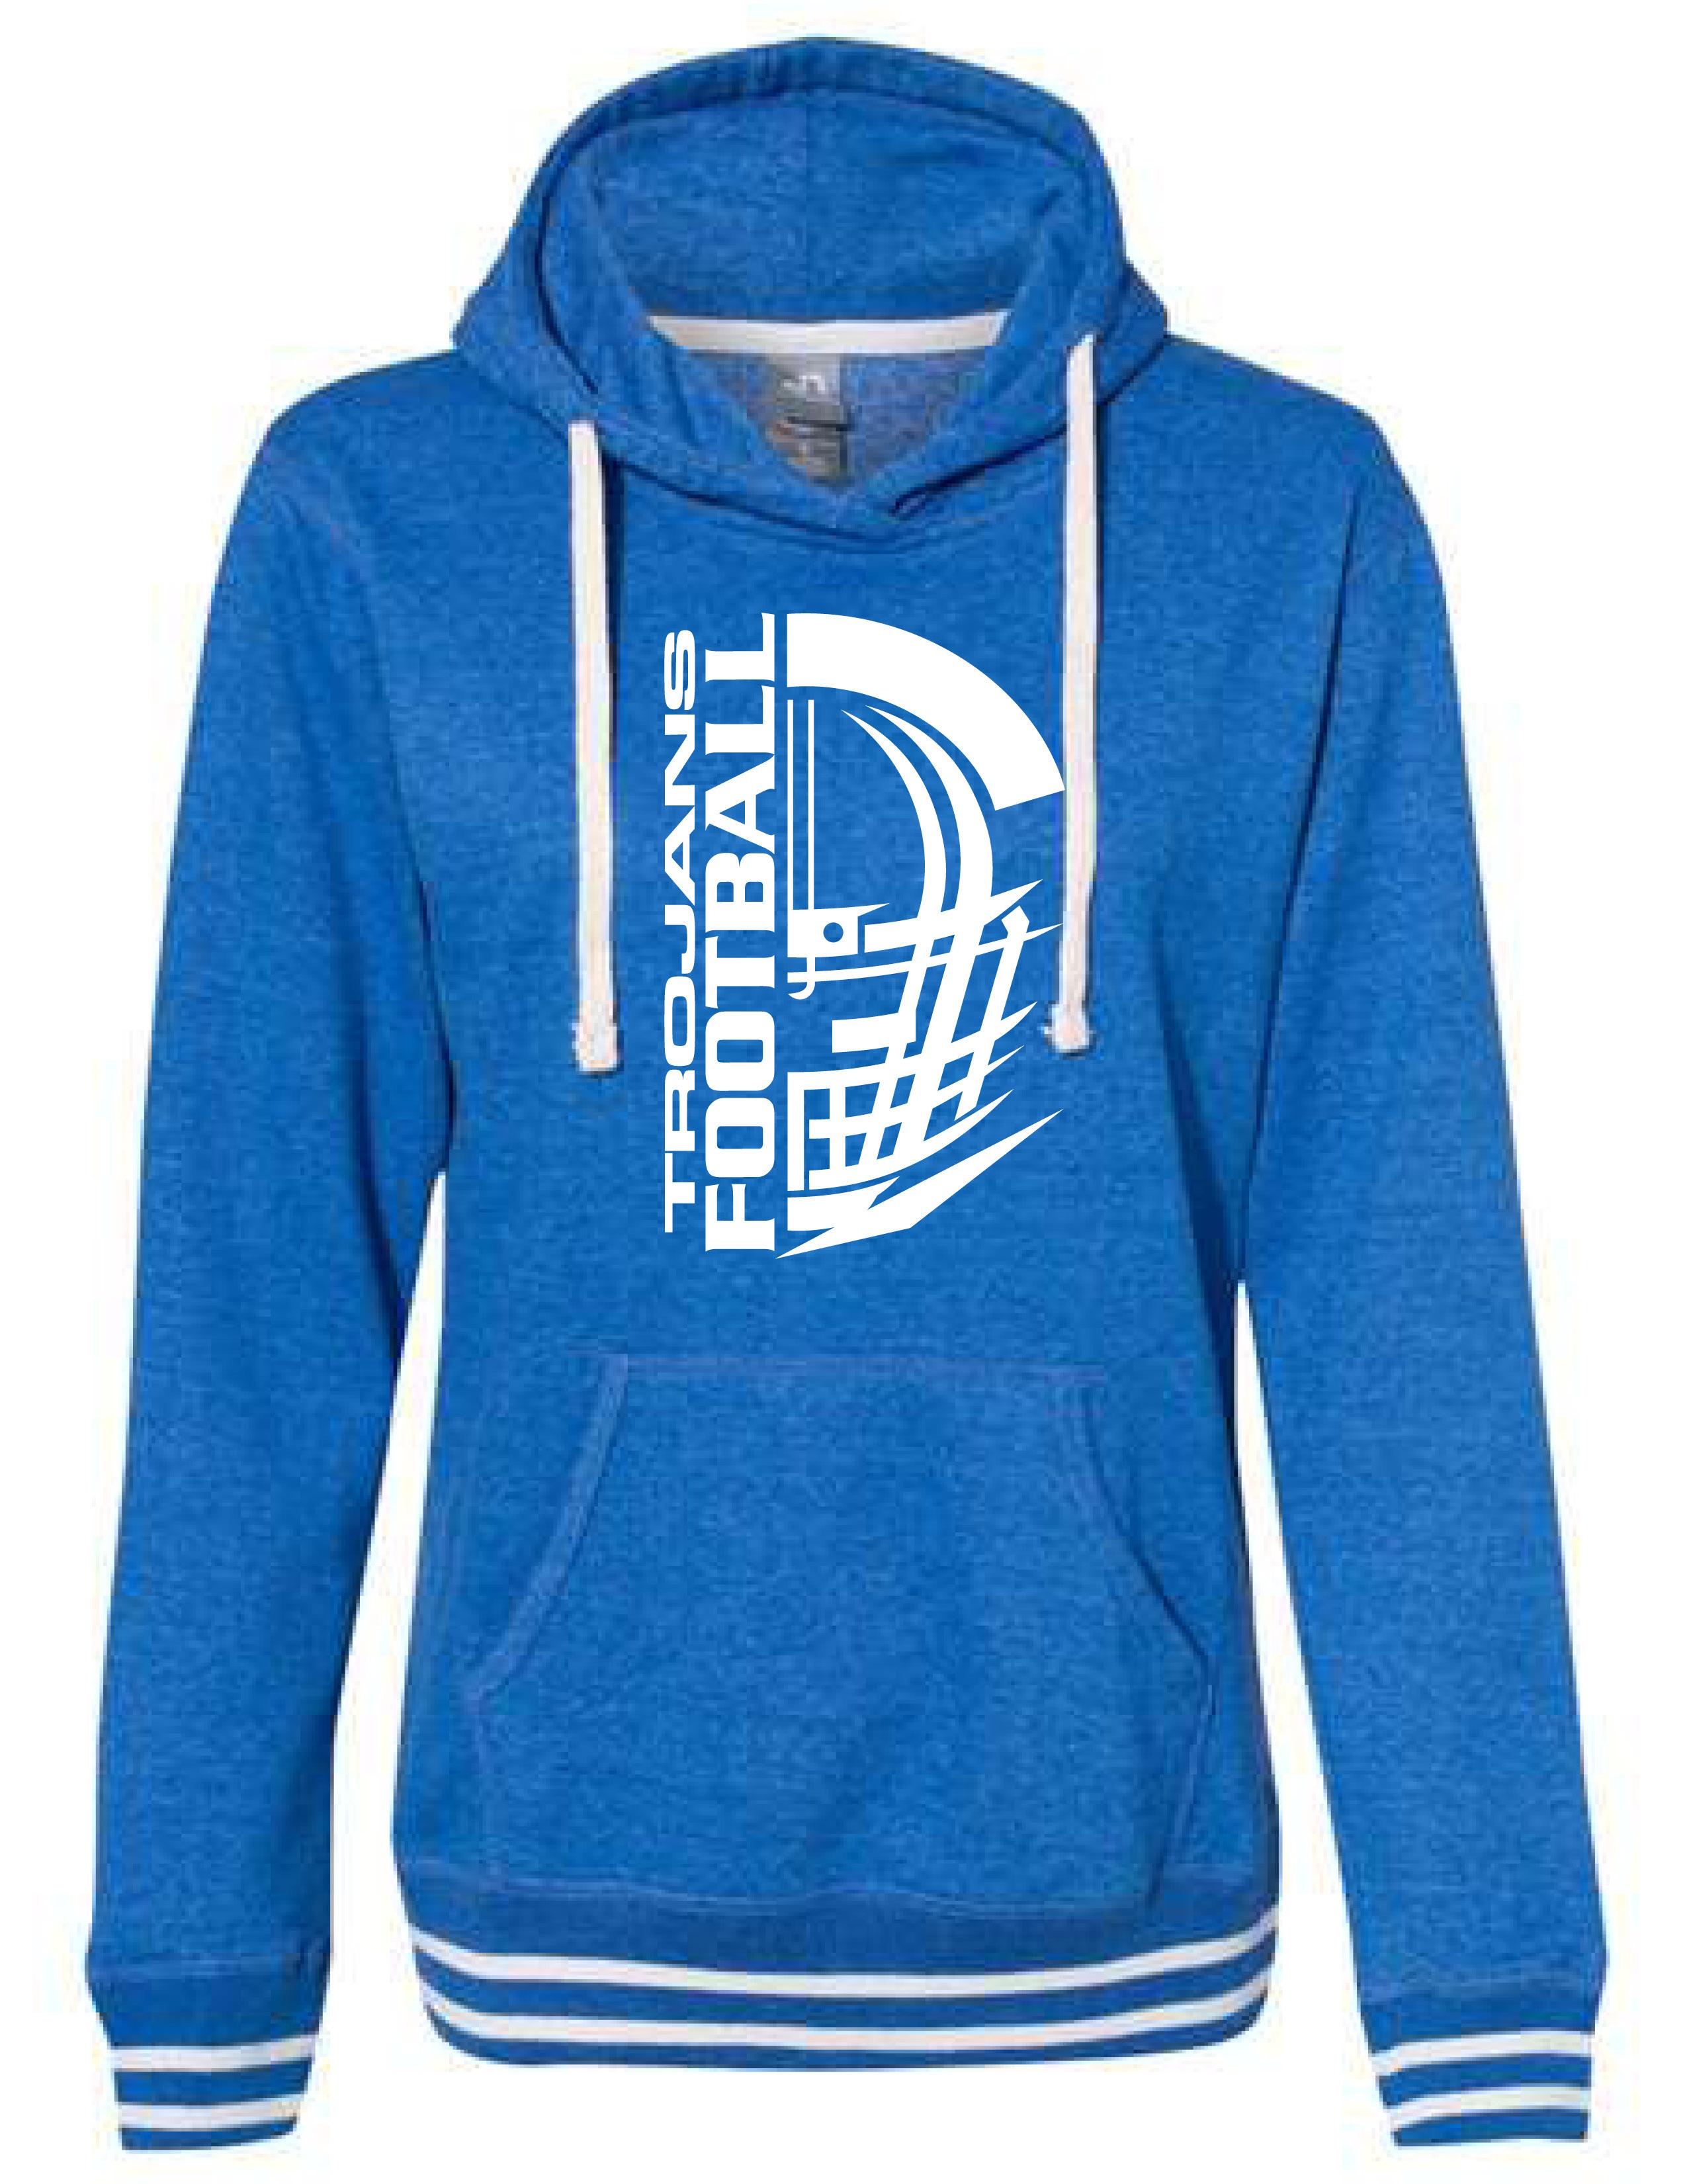 J. America - Women's Hooded Sweatshirt - (HELMET)